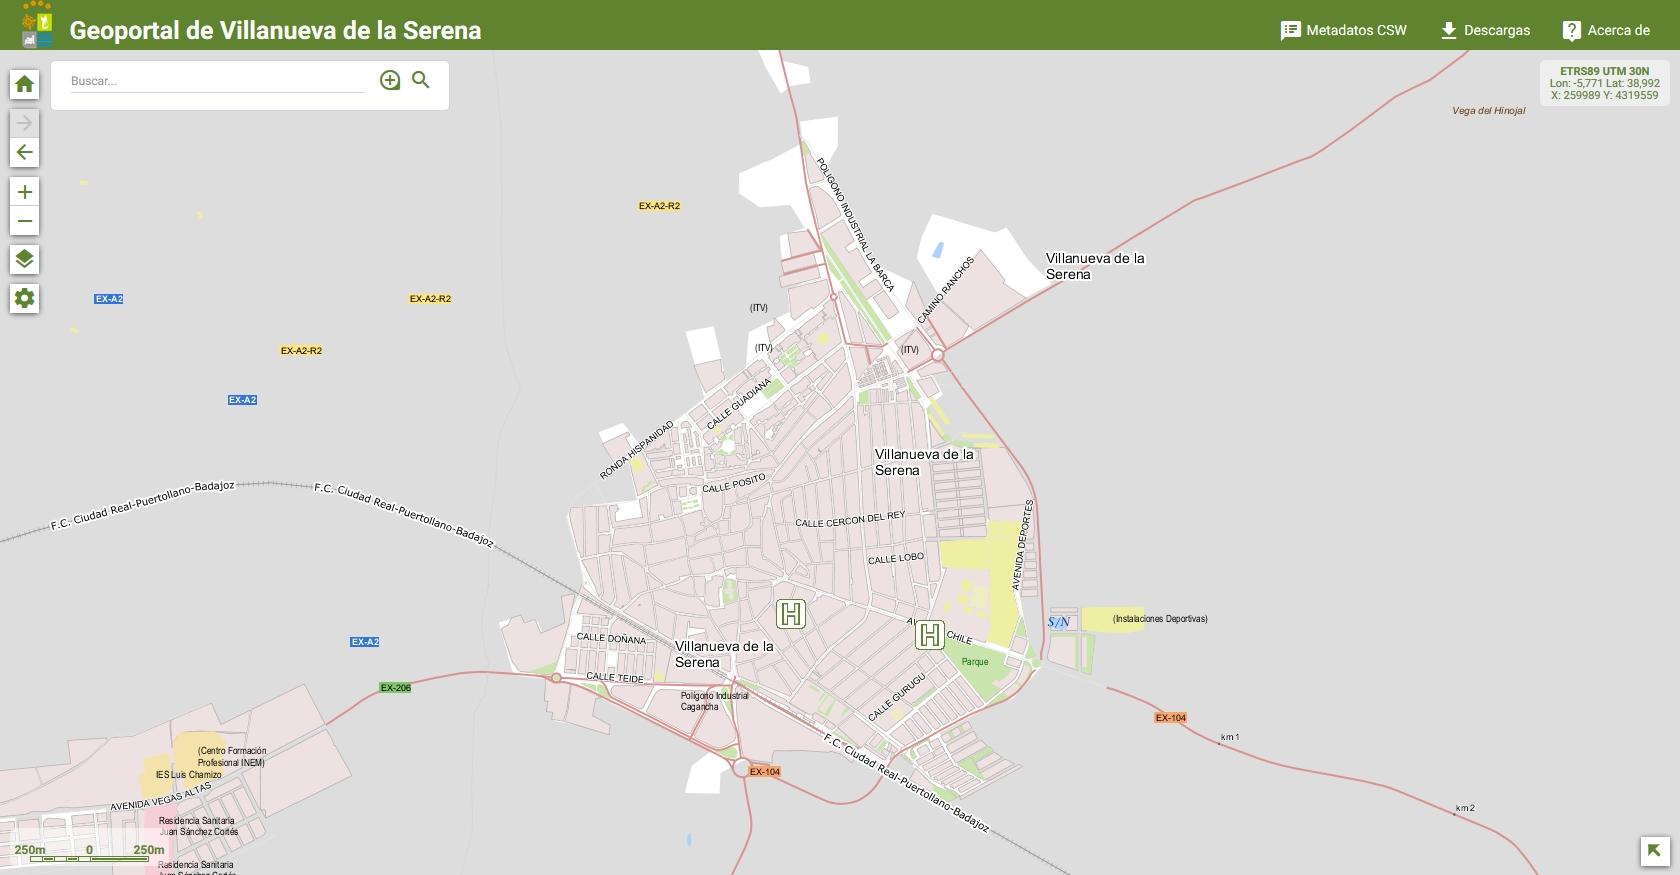 Turismo - Mapa de Alojamientos